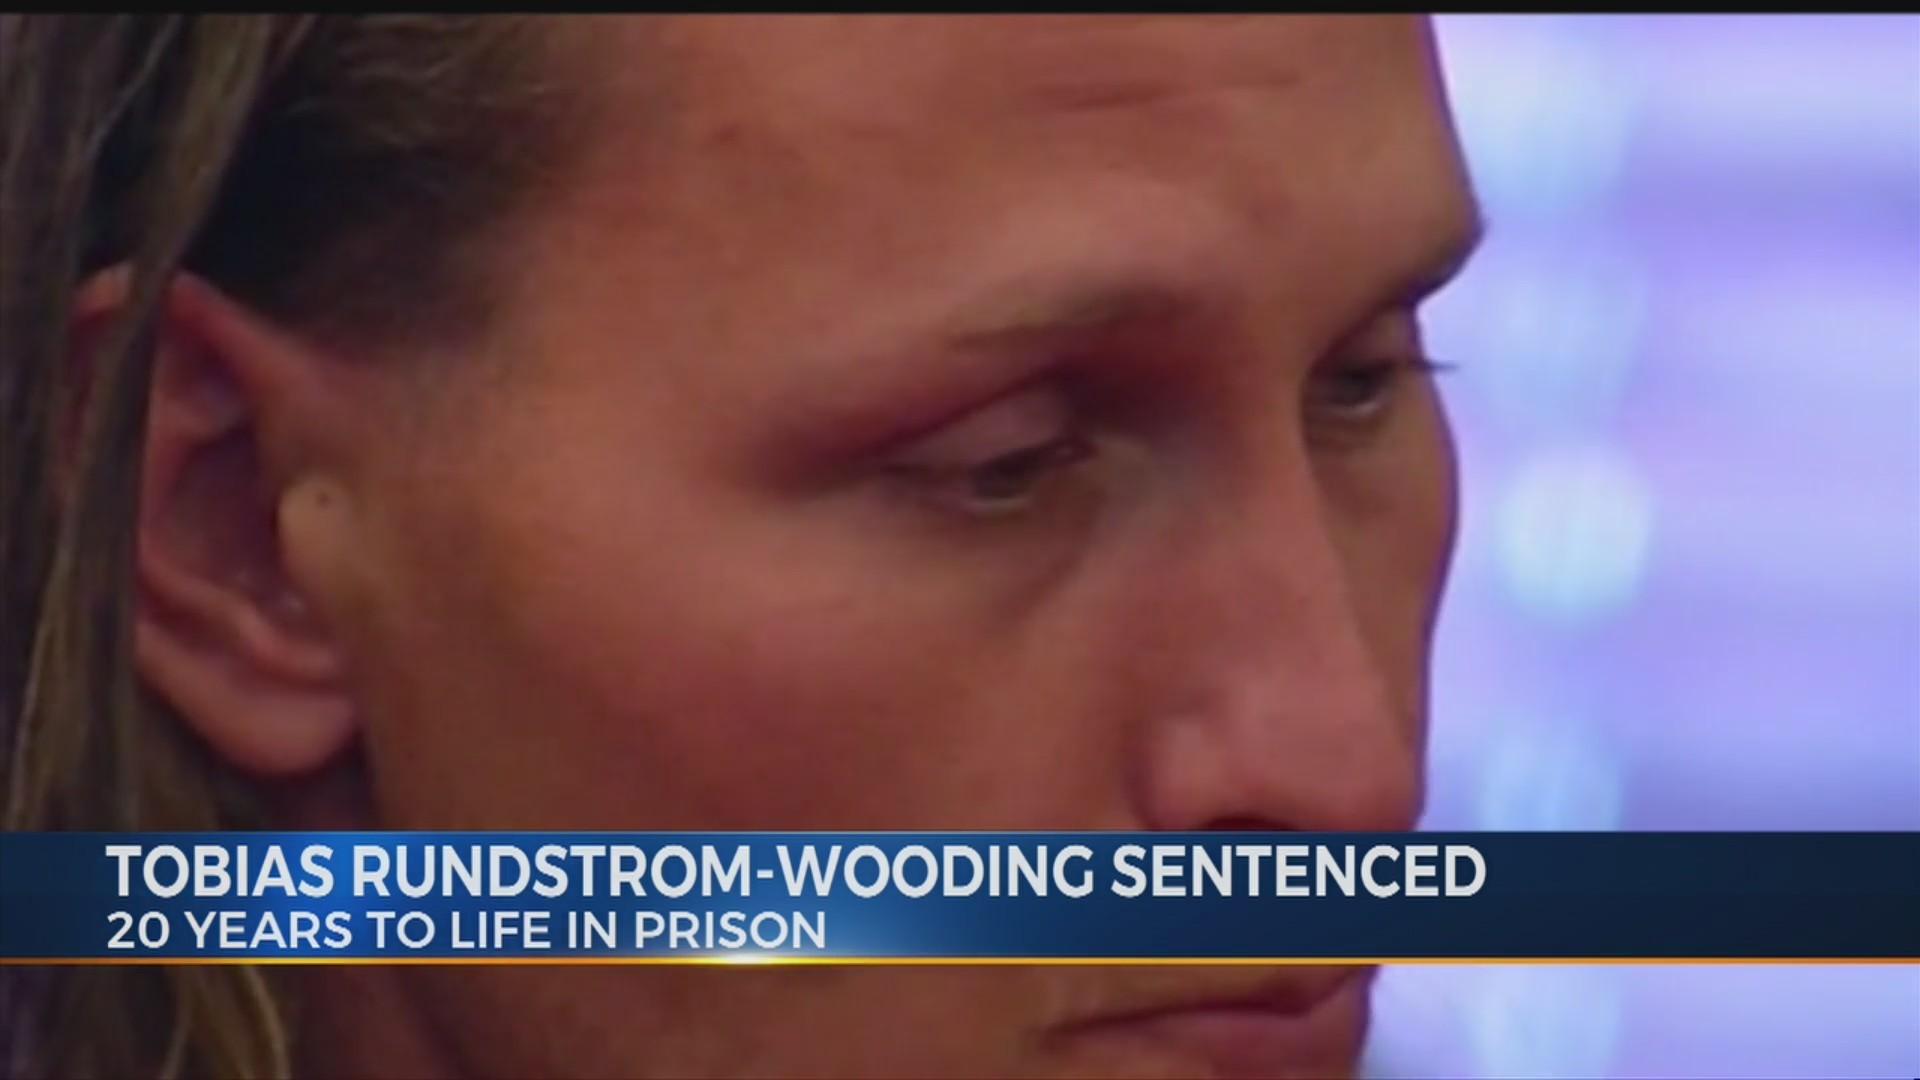 Tobias_Rundstrom_Wooding_Sentenced_0_20180814132104